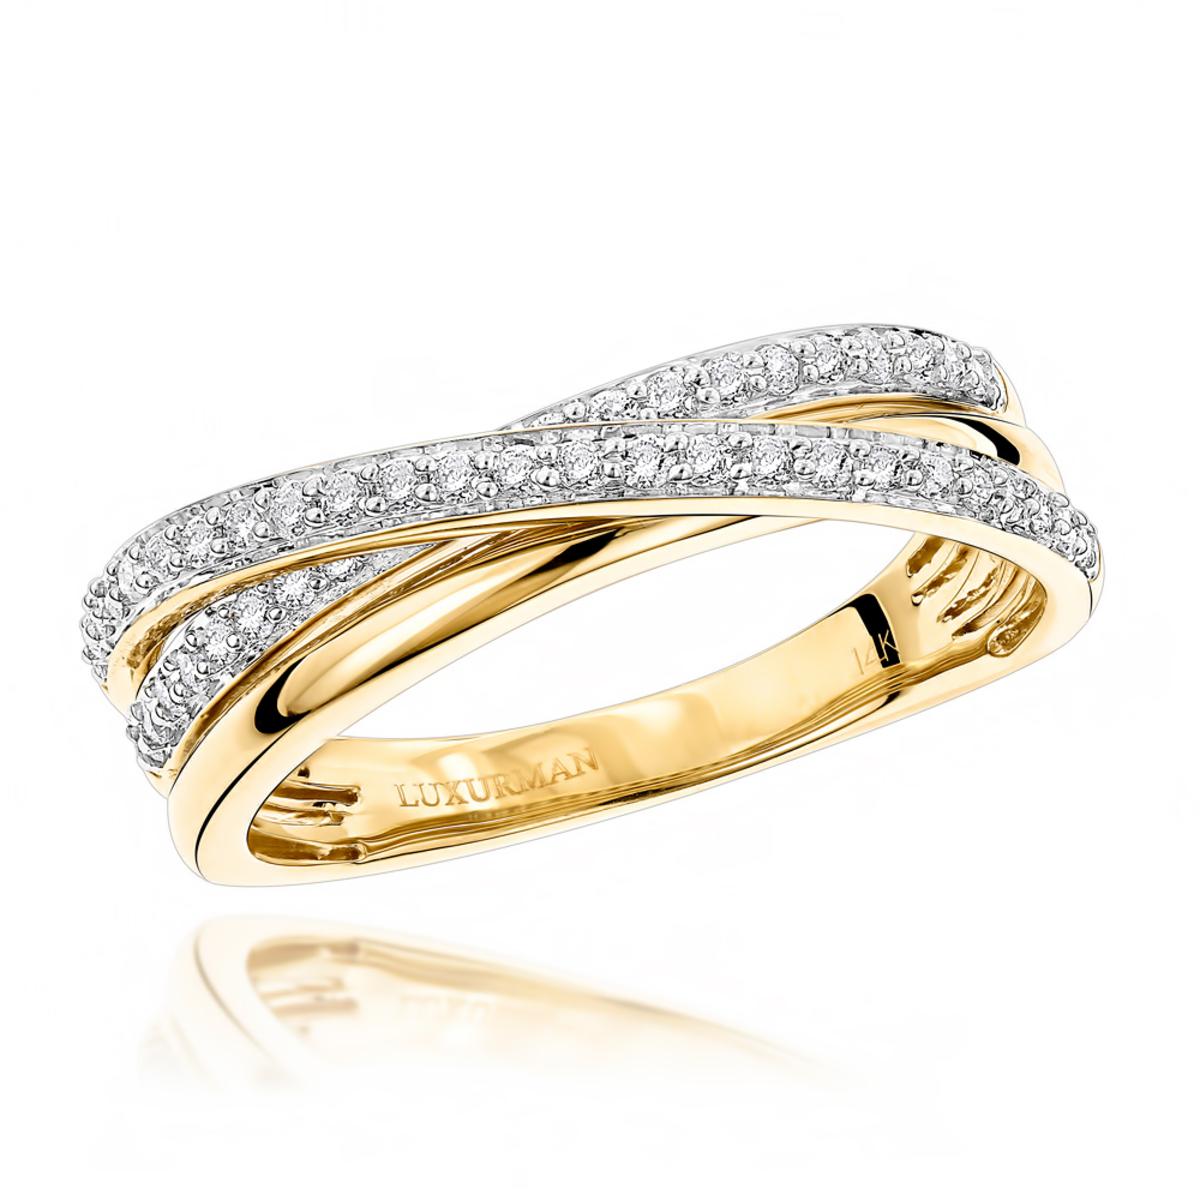 Luxurman Right Hand Rings: Ladies Diamond Criss Cross Ring 14K ...